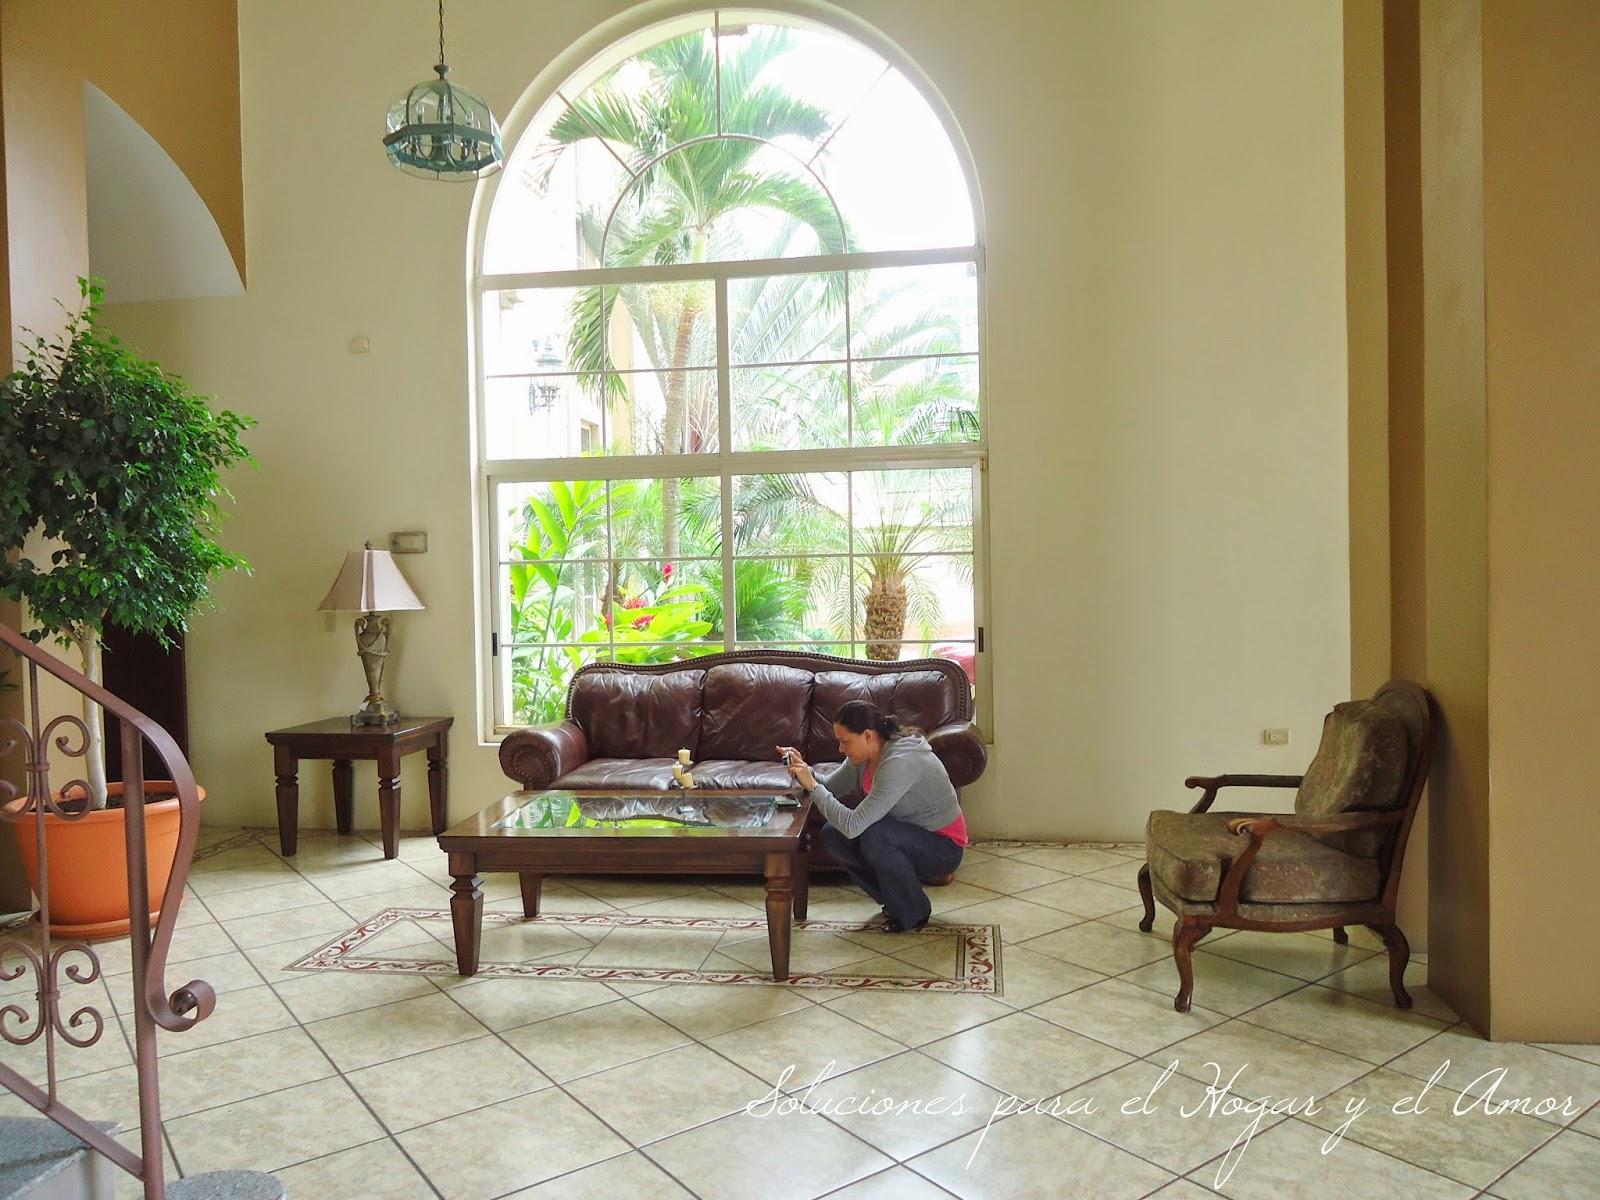 Sala, muebles, ventana grande, ventanal